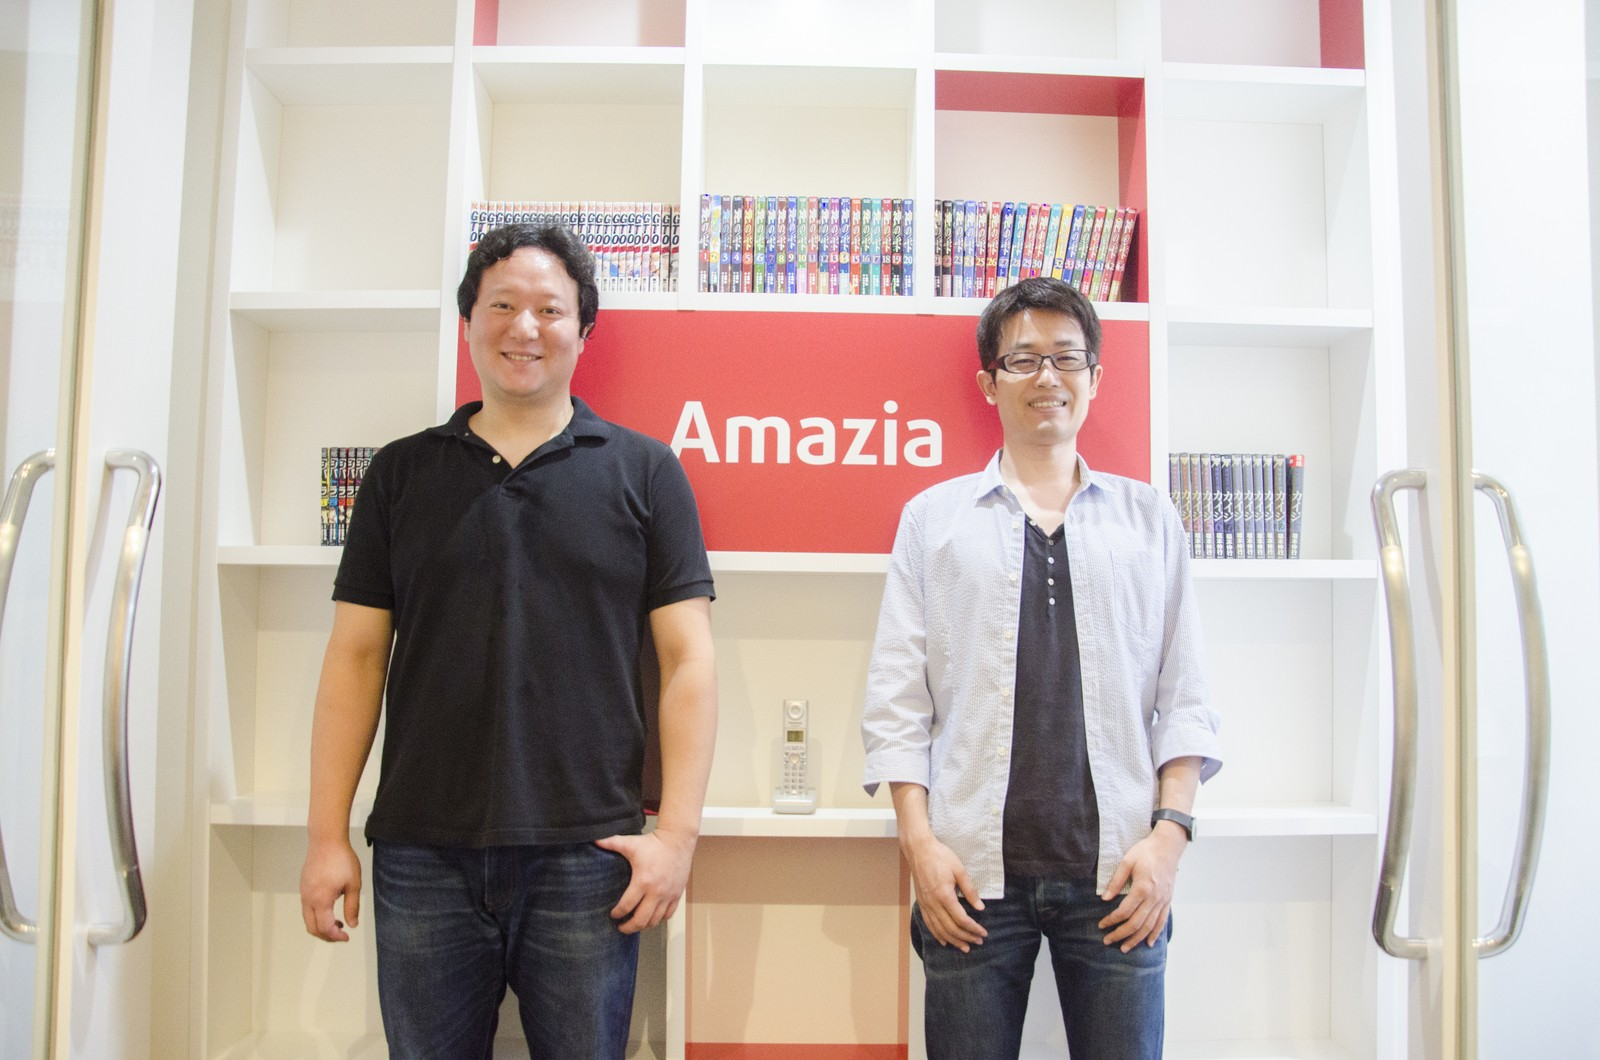 【Ruby】1000万DL突破「マンガBANG!」や新規サービスを少数精鋭のチームで開発するバックエンドエンジニアを募集!